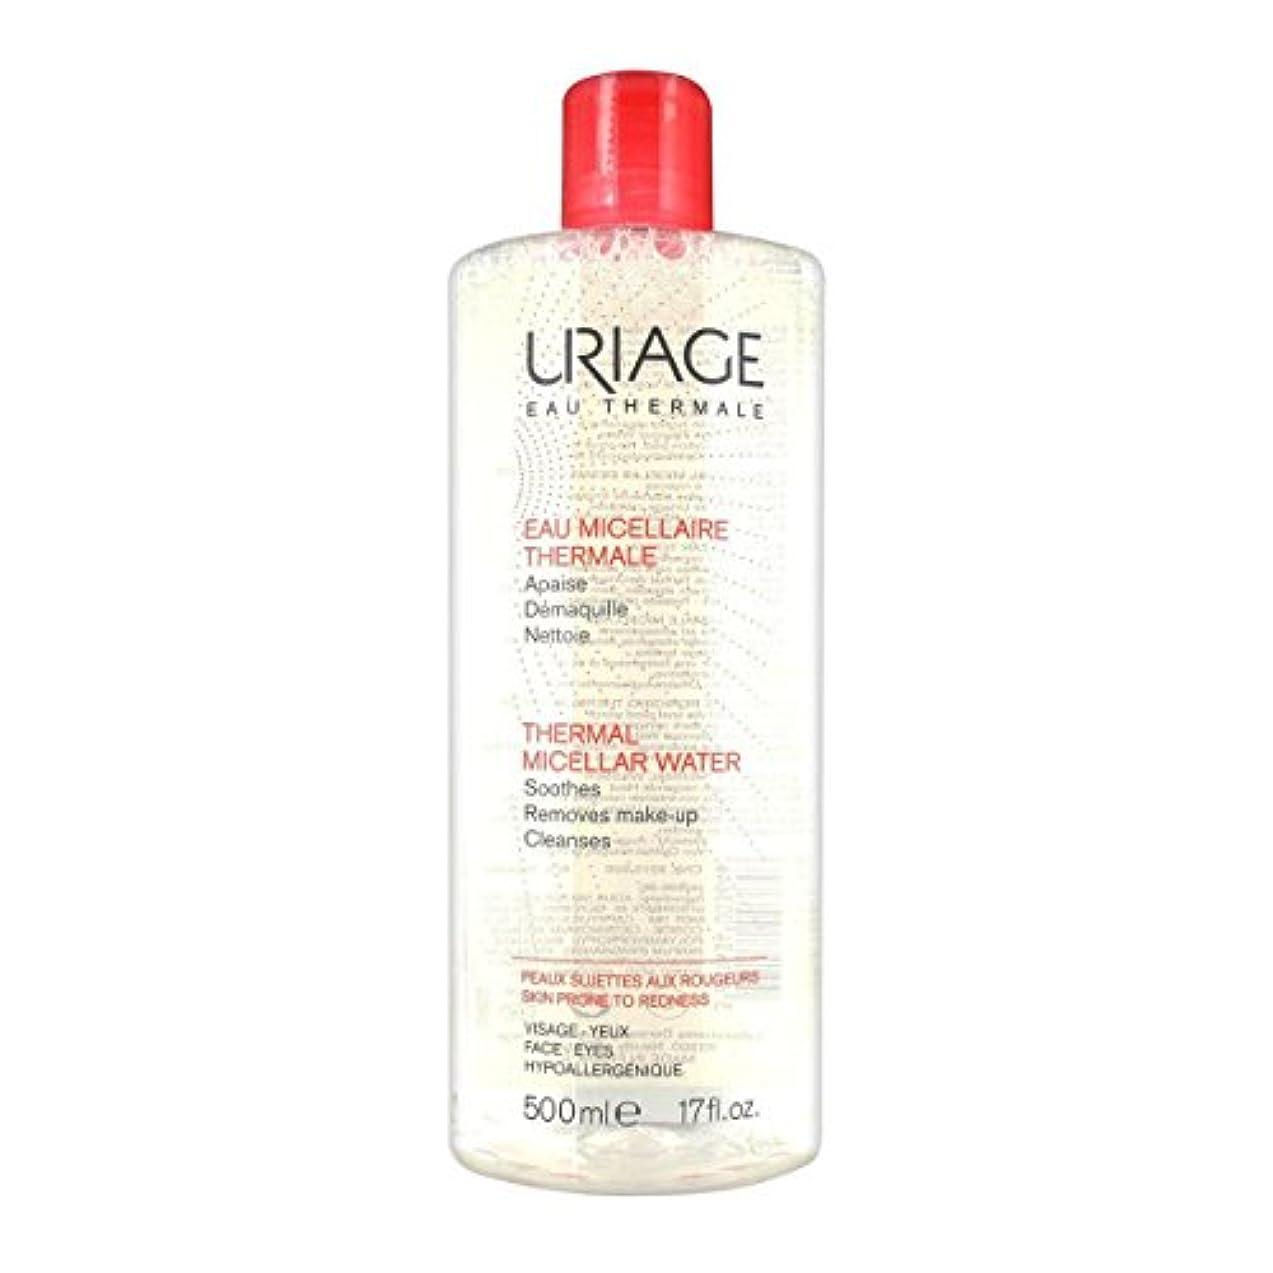 Uriage Thermal Micellar Water Skin Prone To Redness 500ml [並行輸入品]